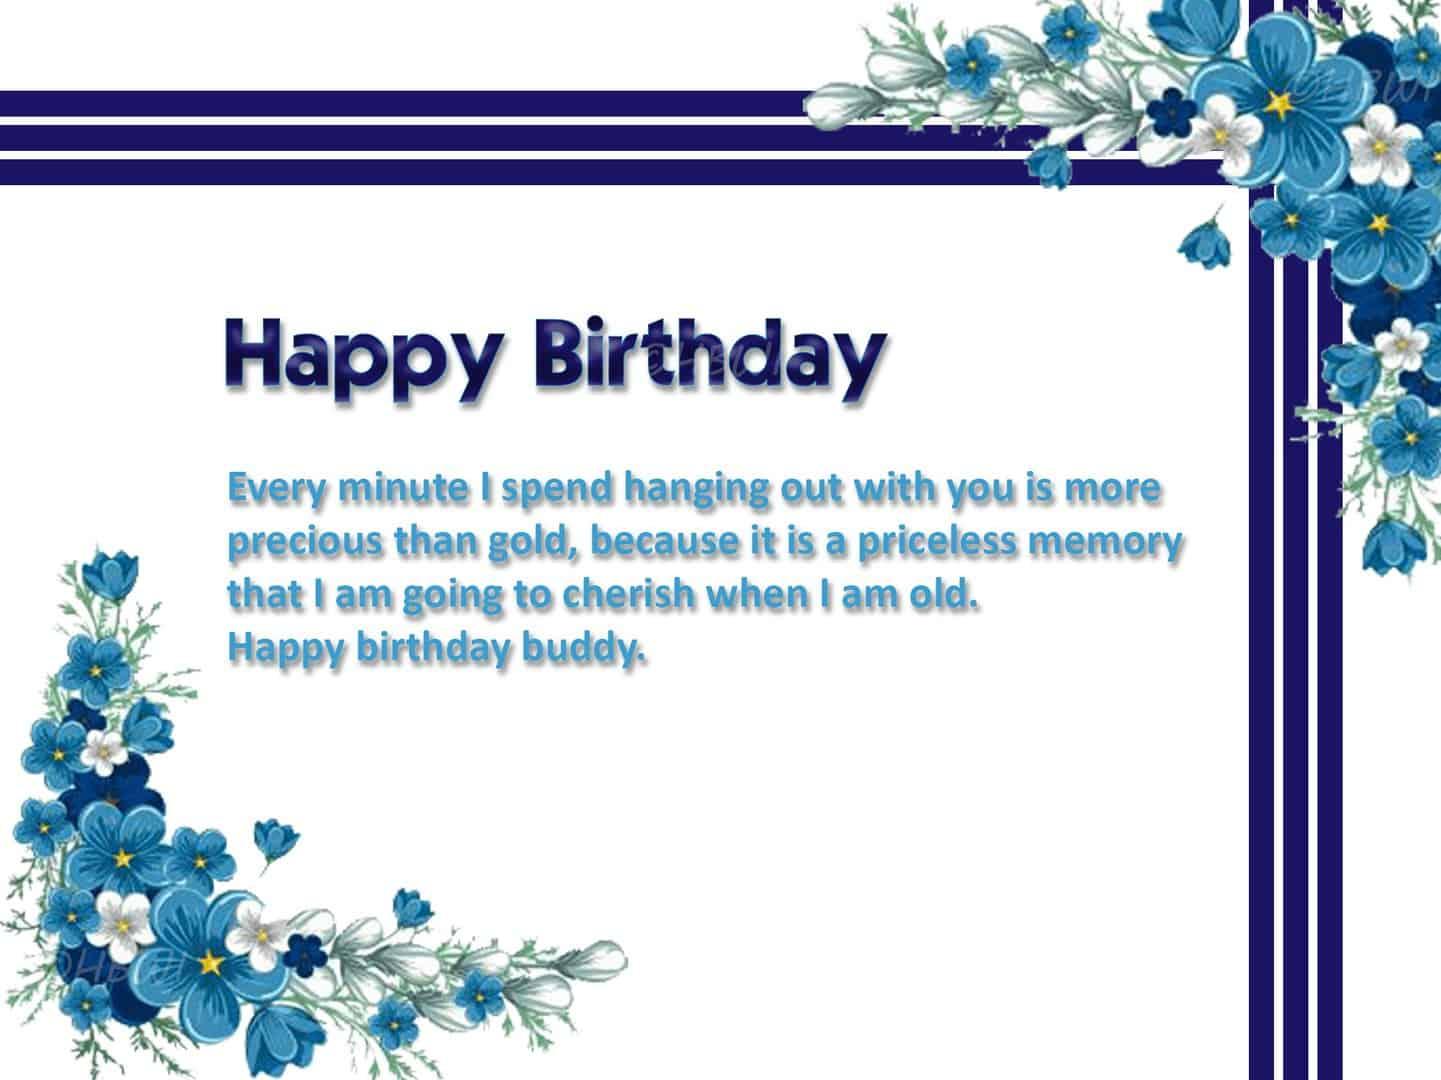 Simple but beautiful birthday wish card